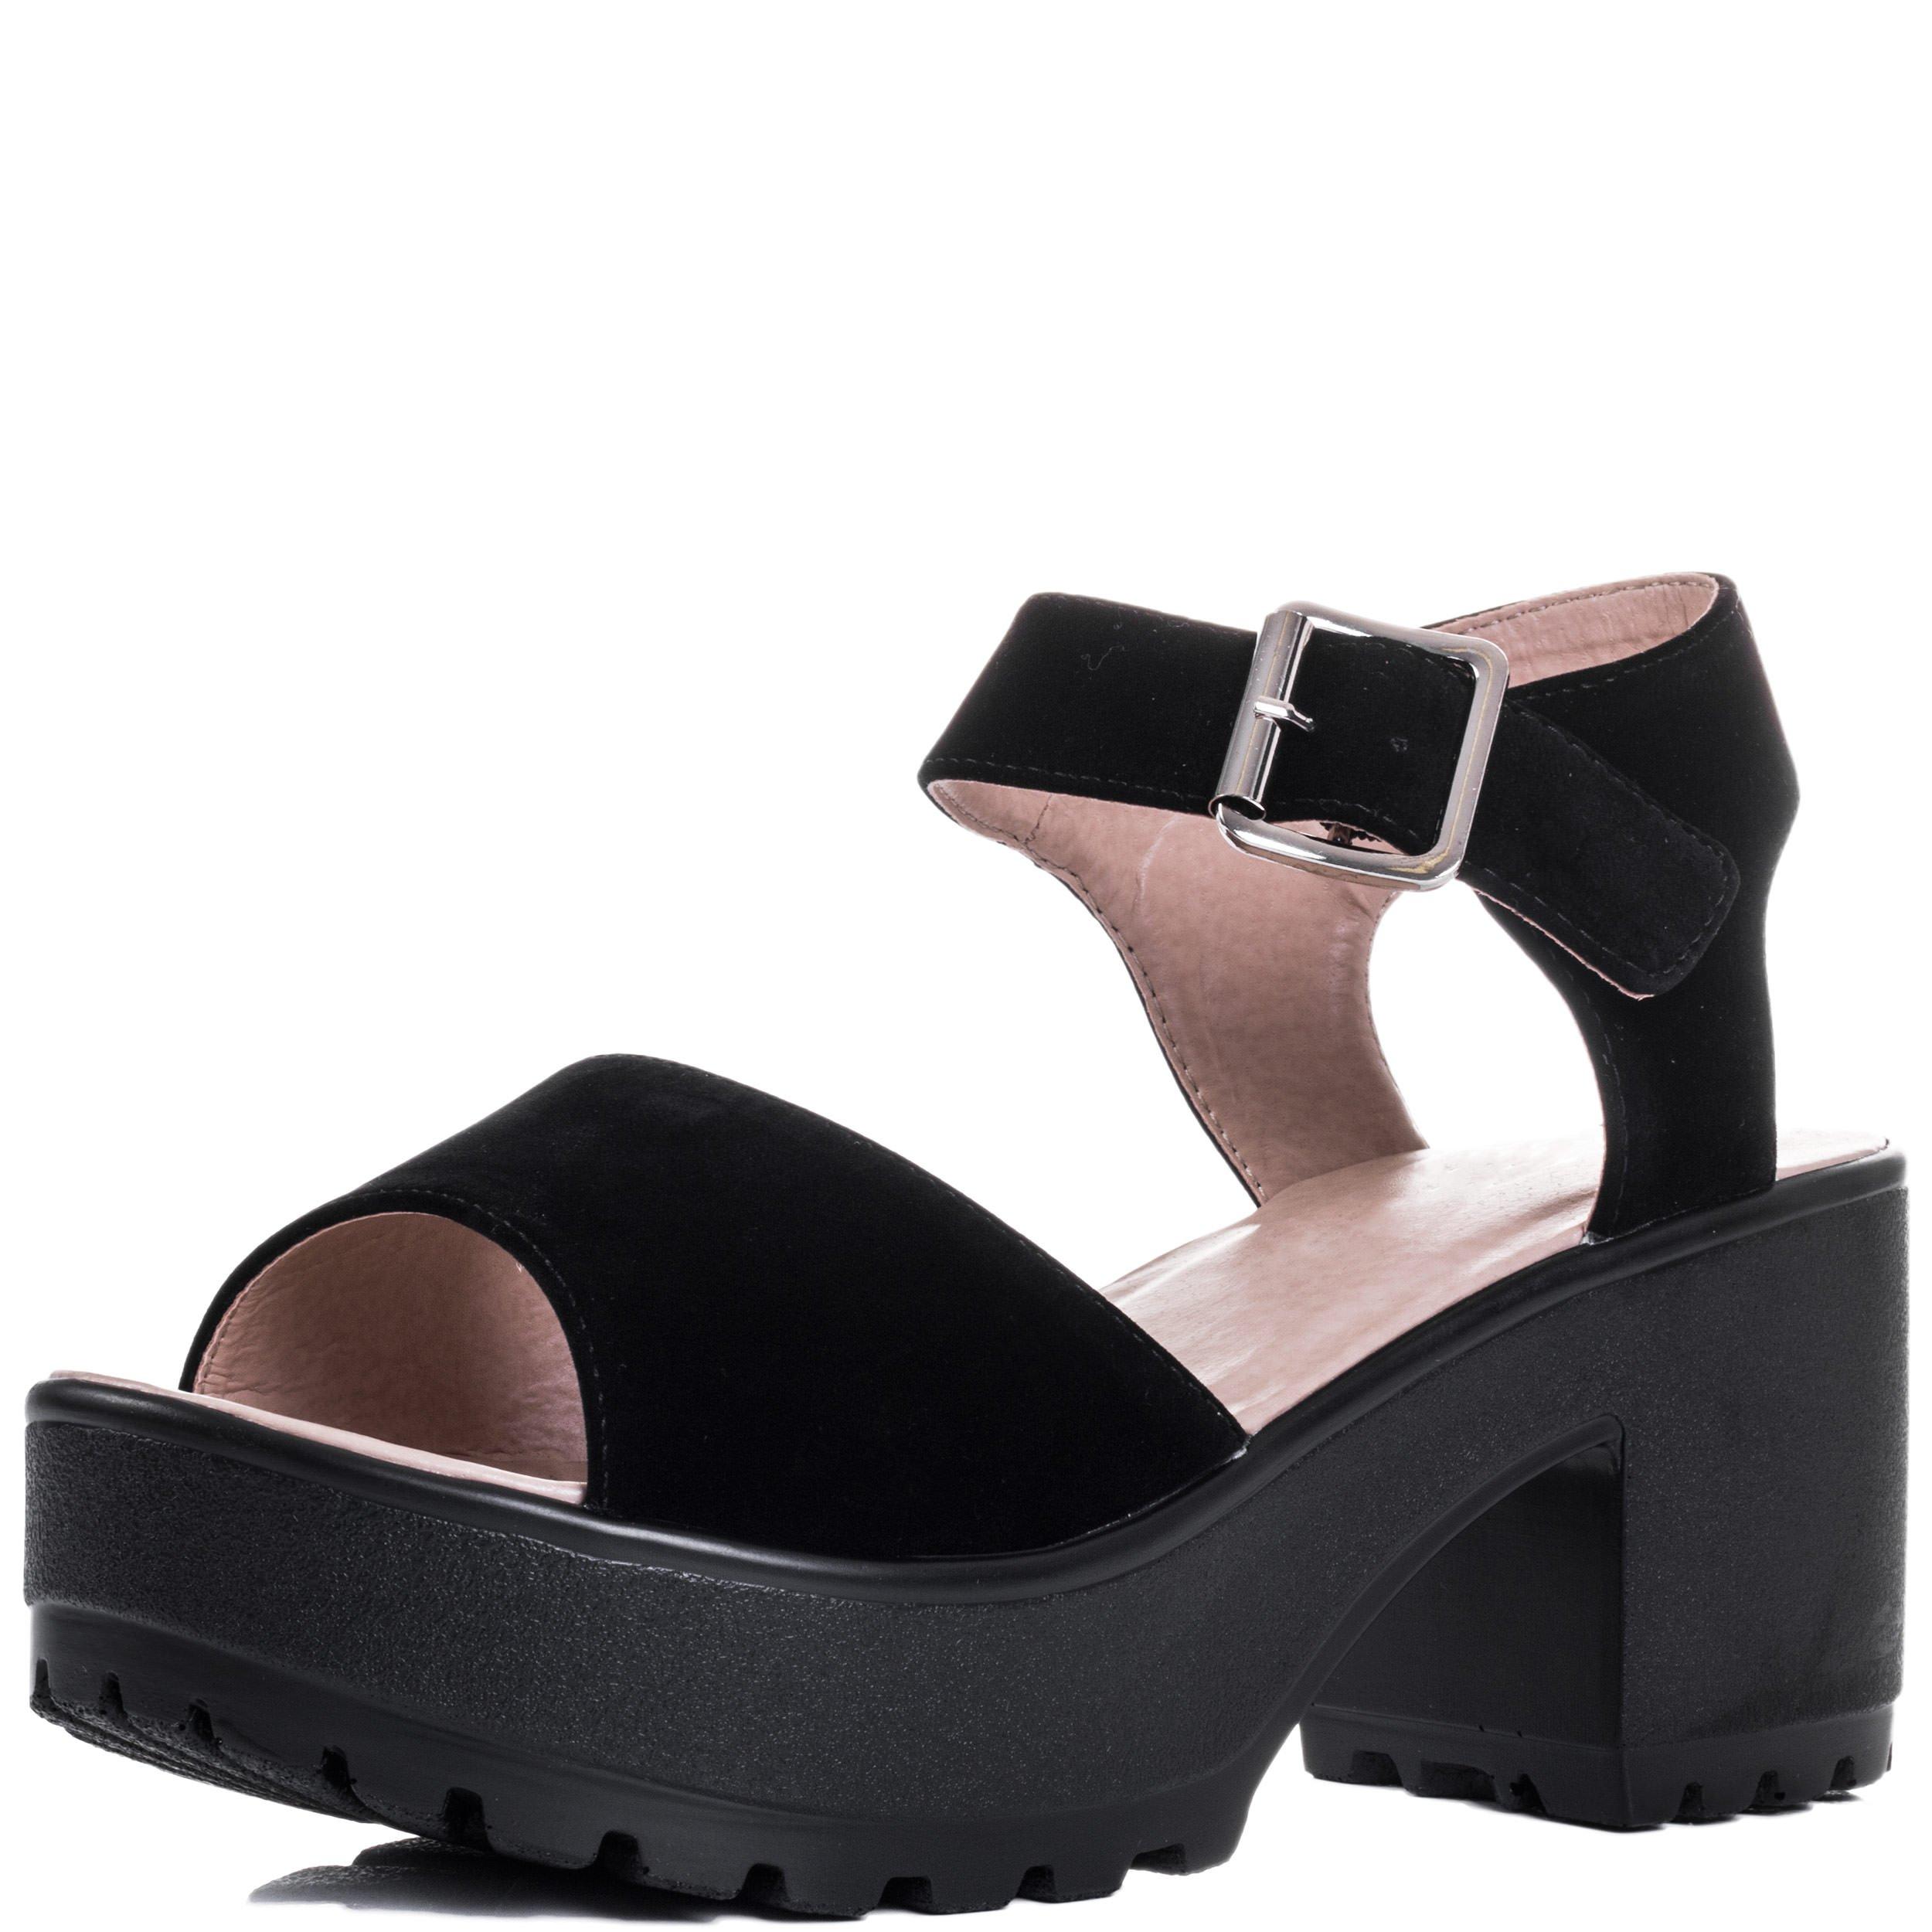 Spylovebuy Platform Block Heel Sandals Shoes Black Suede Style SZ 5